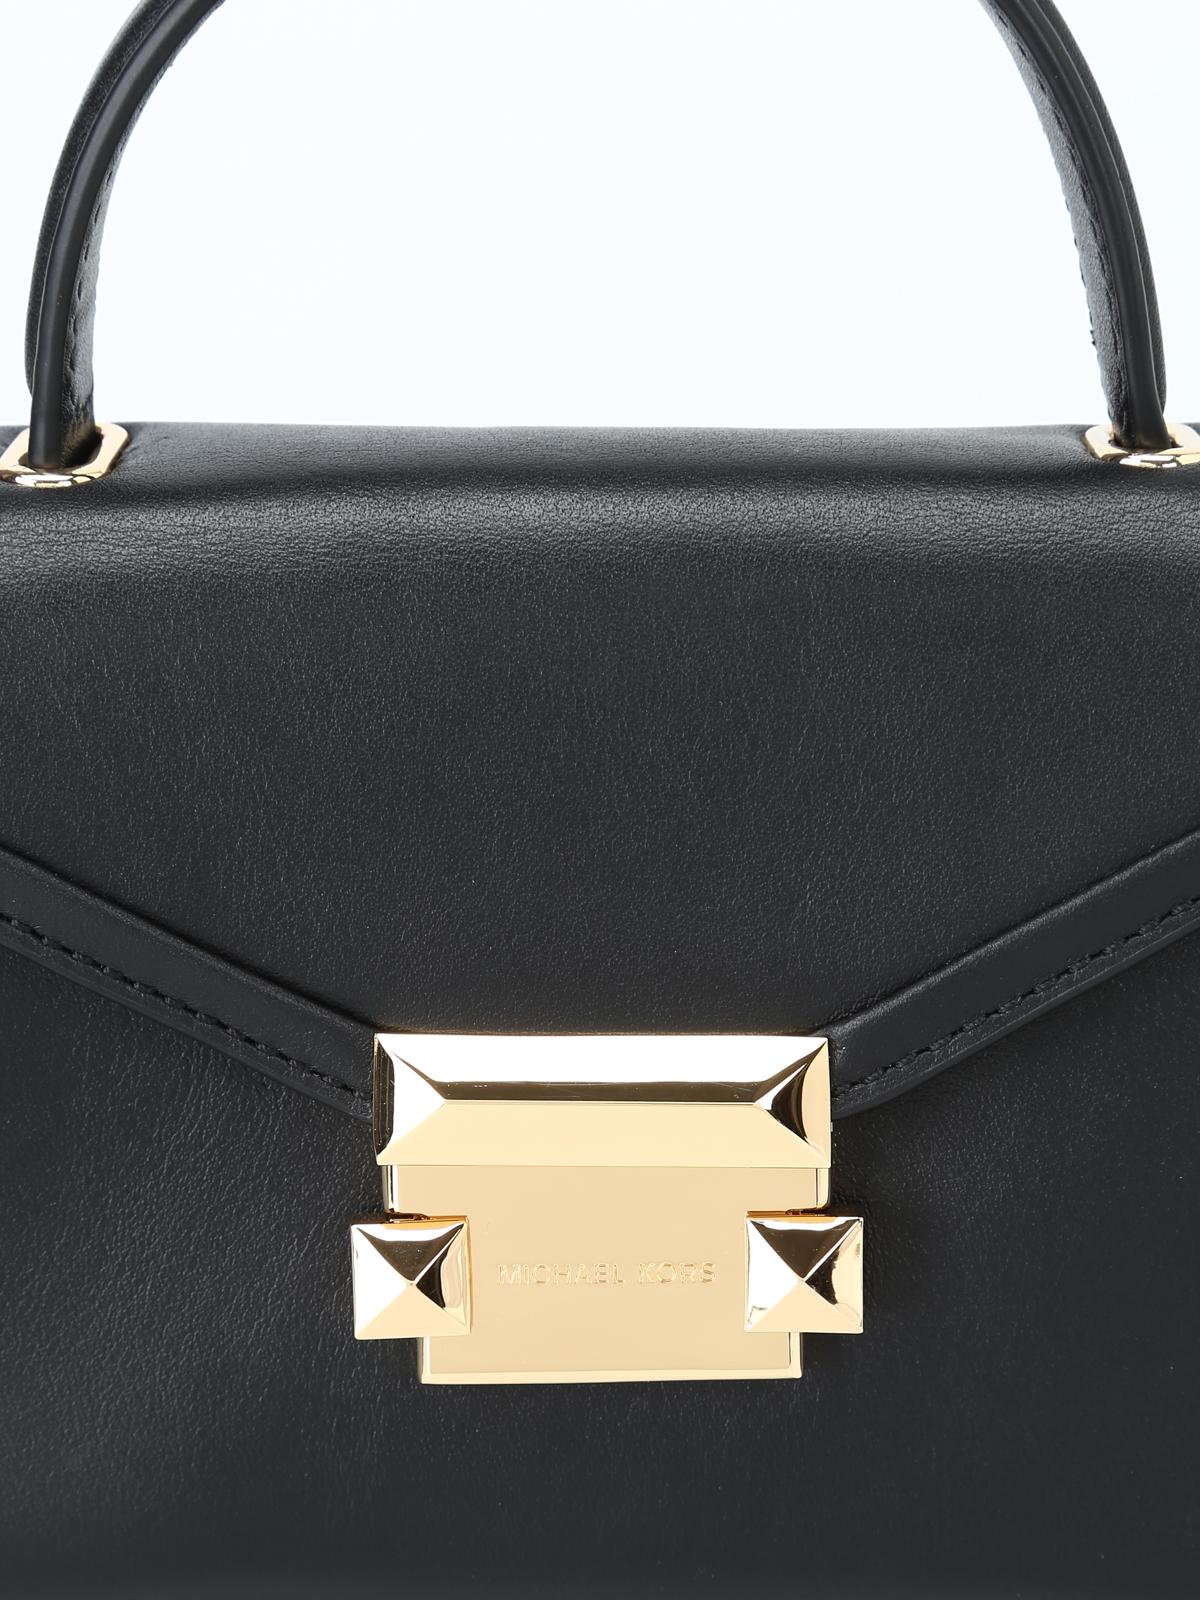 8648278b79 Michael Kors - Mini borsa Whitney in pelle nera - borse a tracolla ...